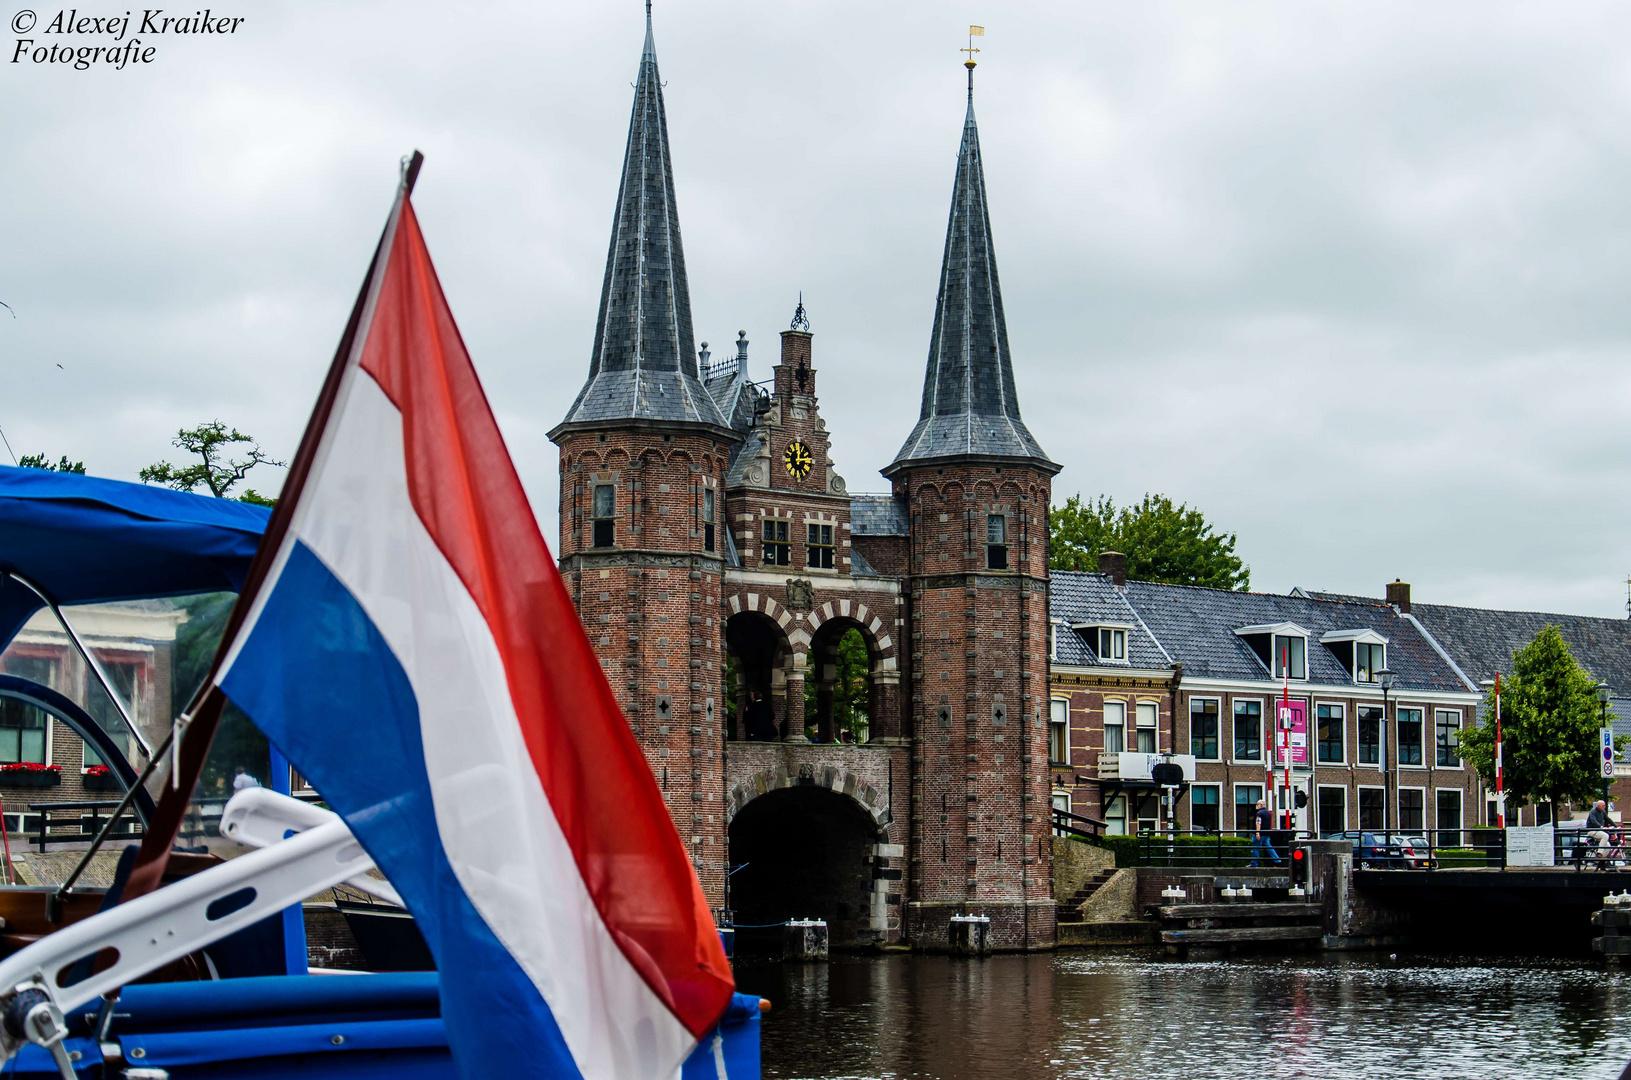 Waterpoort Sneek Foto & Bild | europe, benelux, netherlands Bilder auf fotocommunity